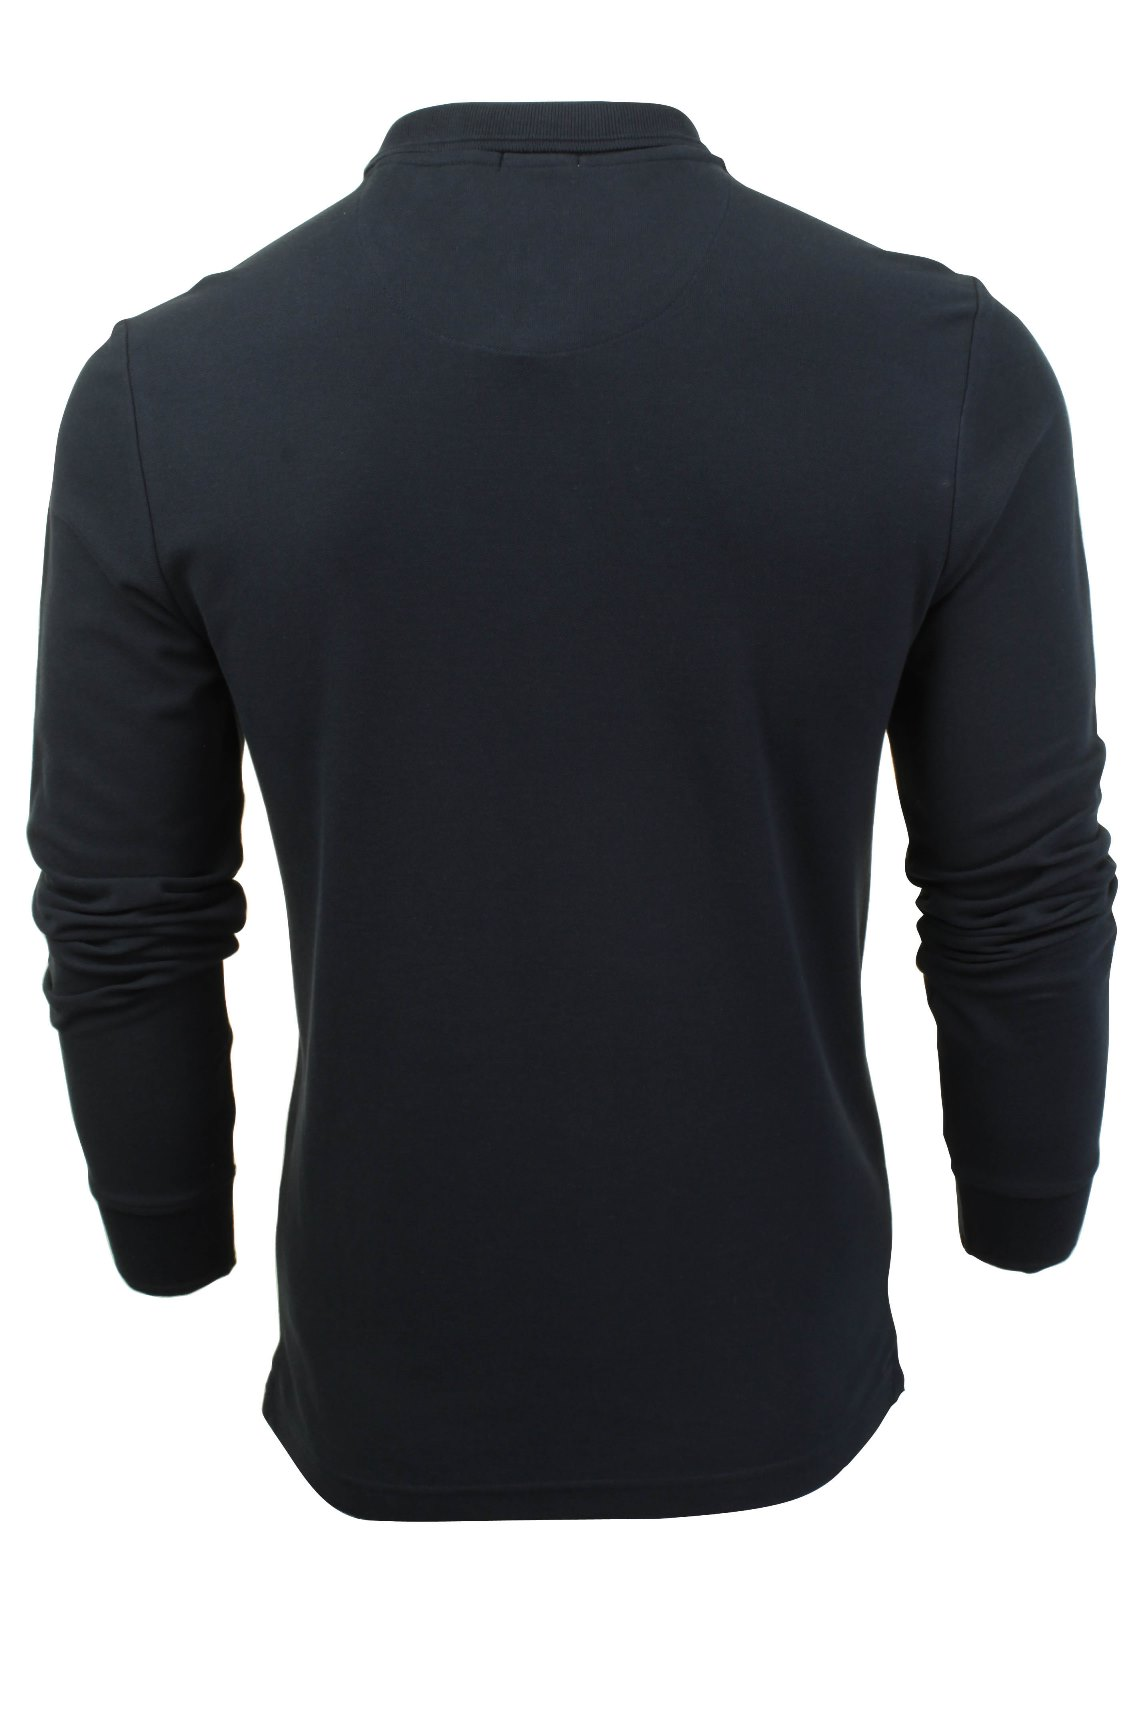 Mens-Polo-T-Shirt-by-Original-Penguin-039-Winston-039-Long-Sleeved thumbnail 5